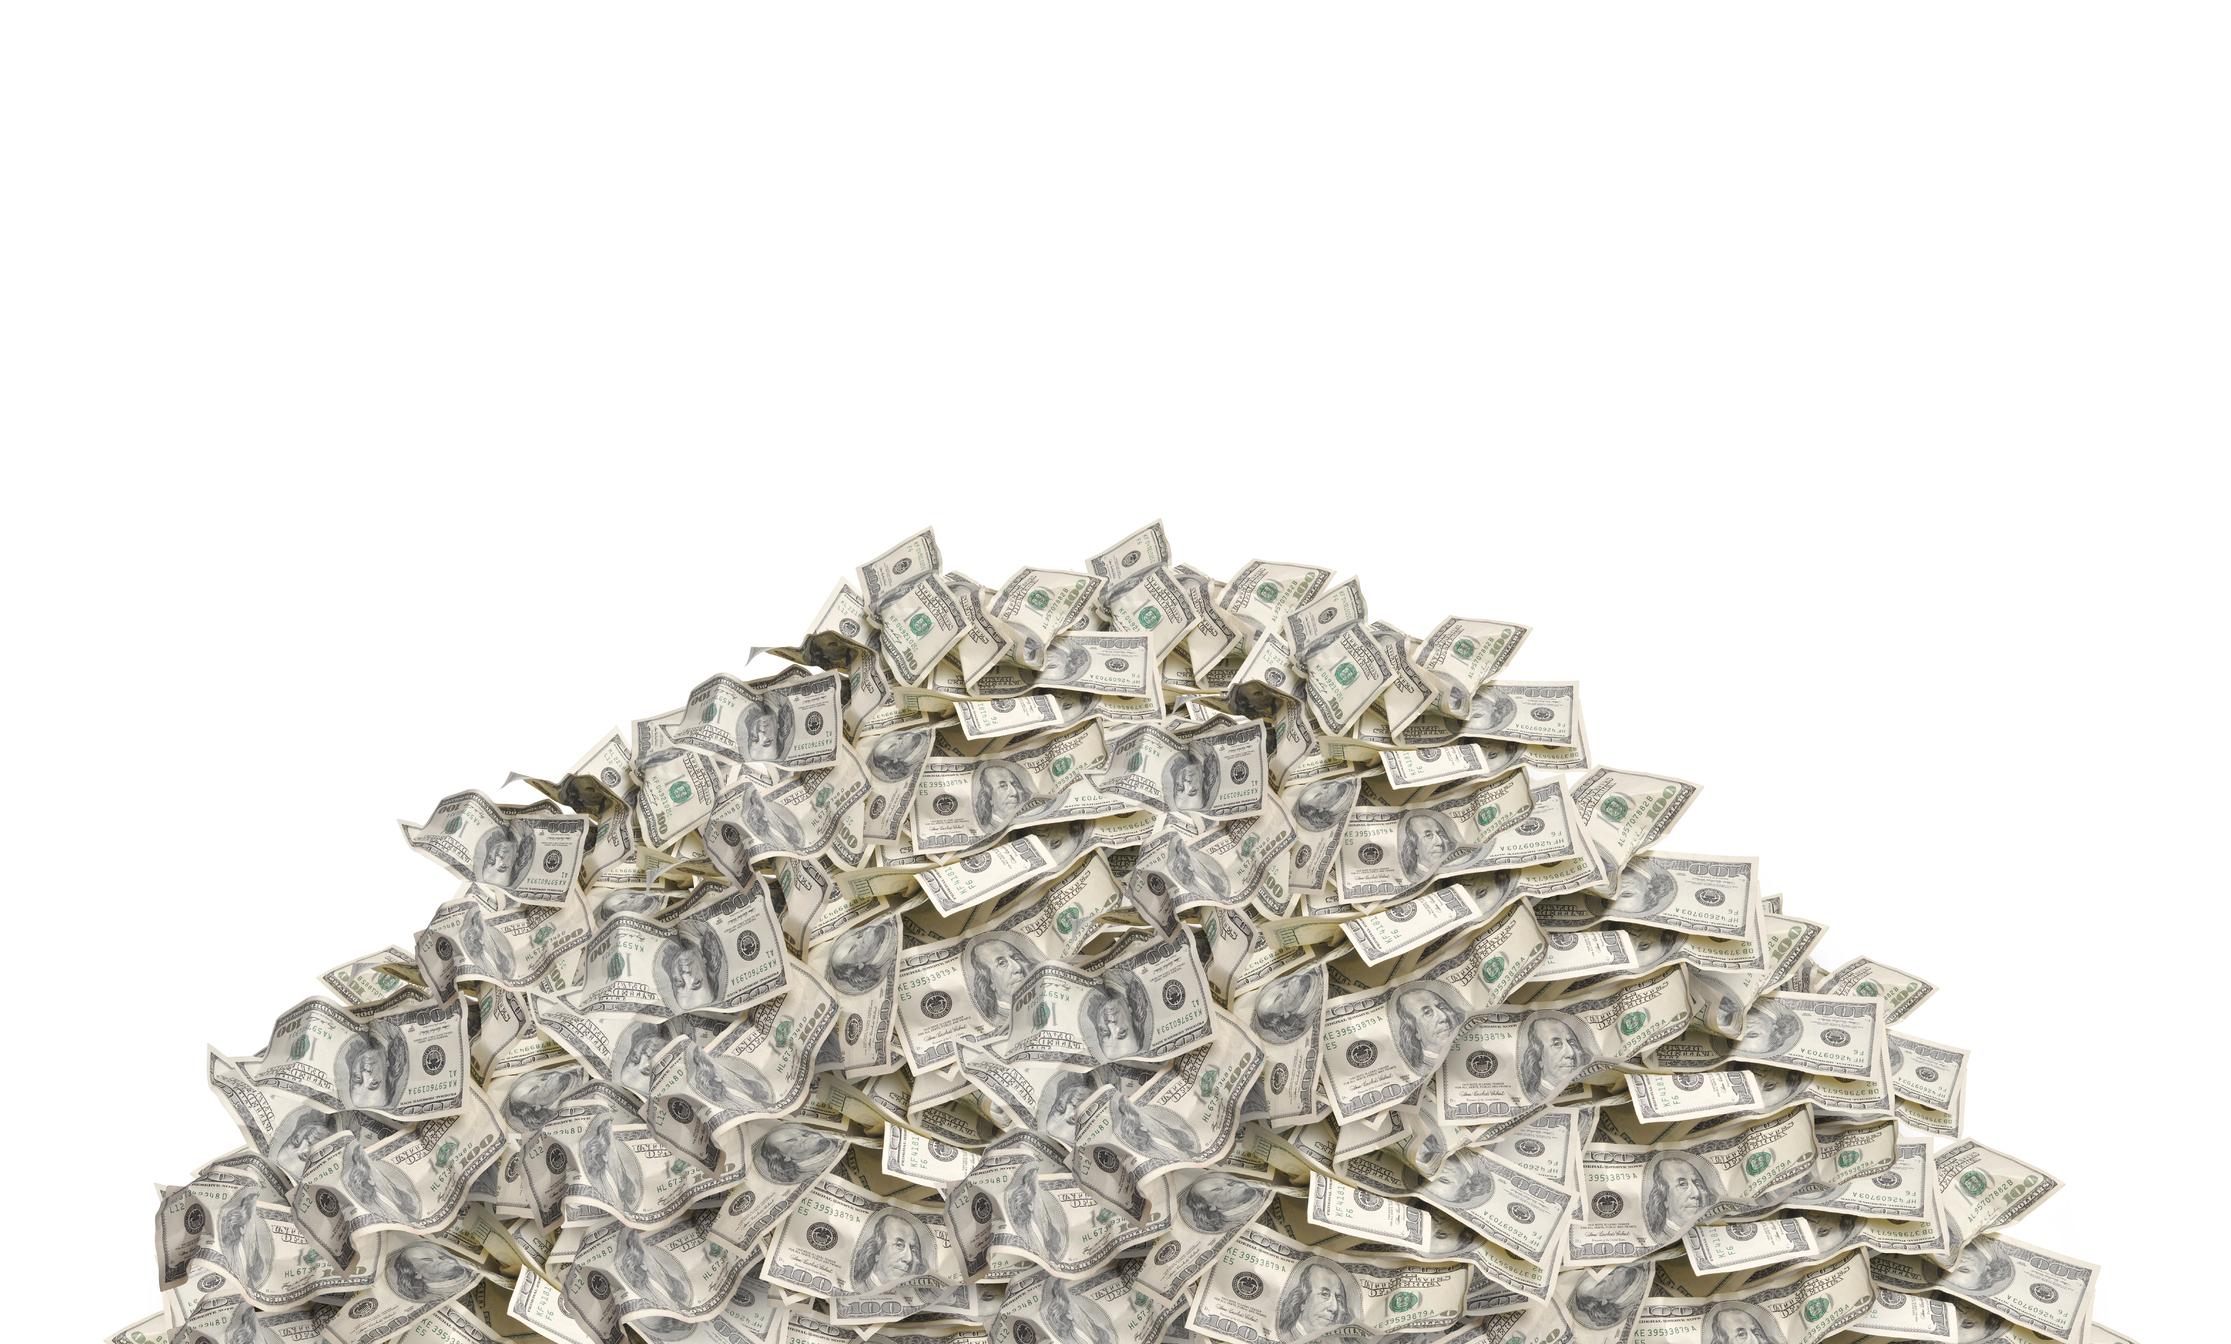 Pile of dollar bills